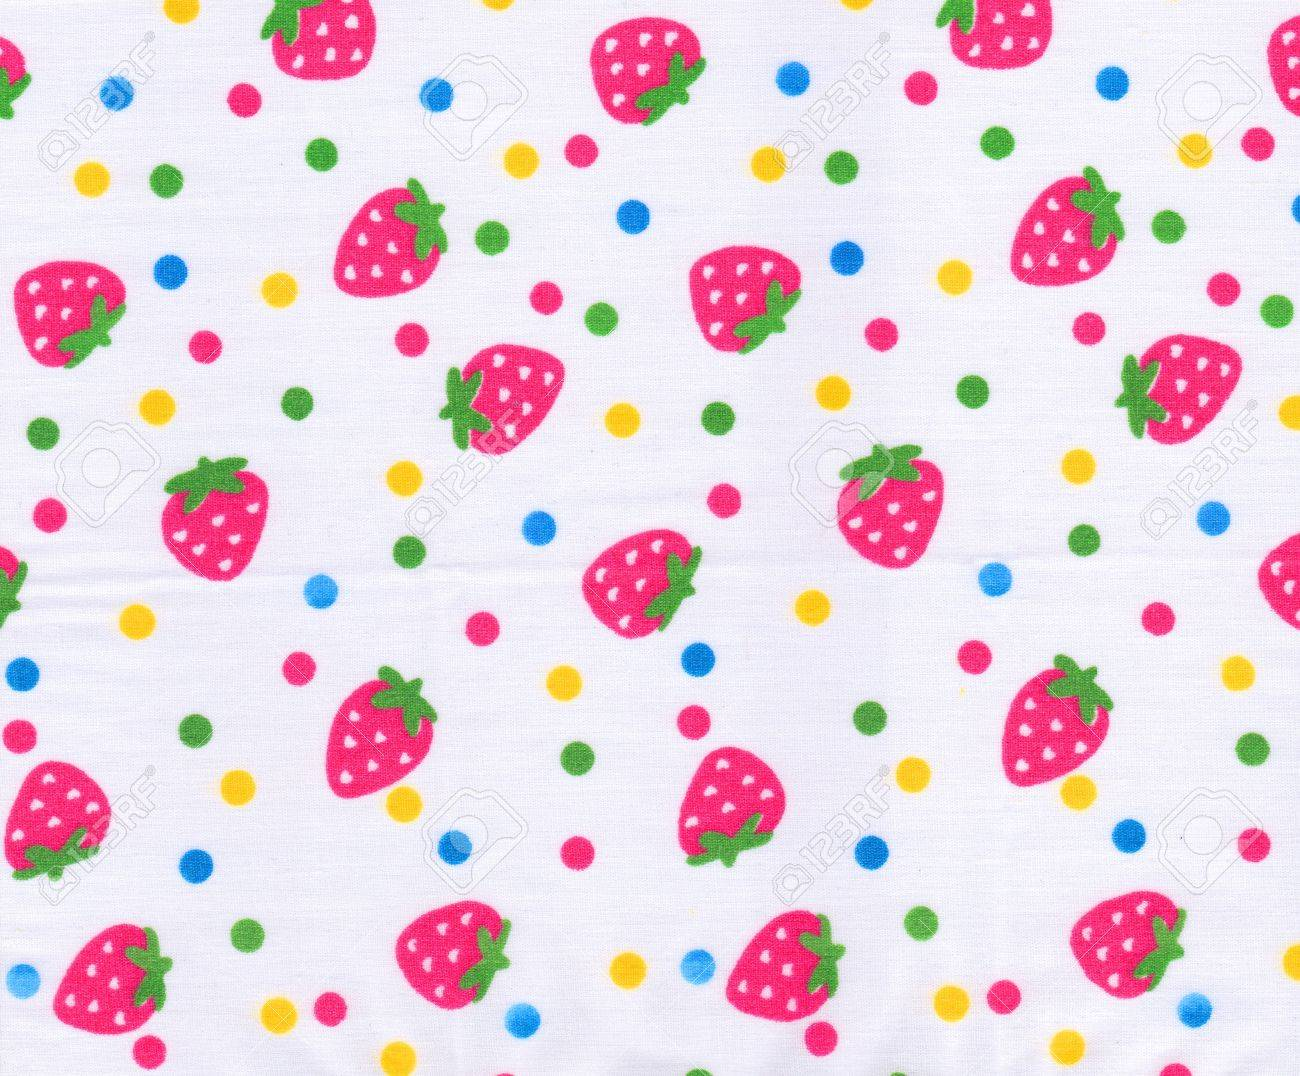 Strawberry pattern on white fabric background Stock Photo - 15115344